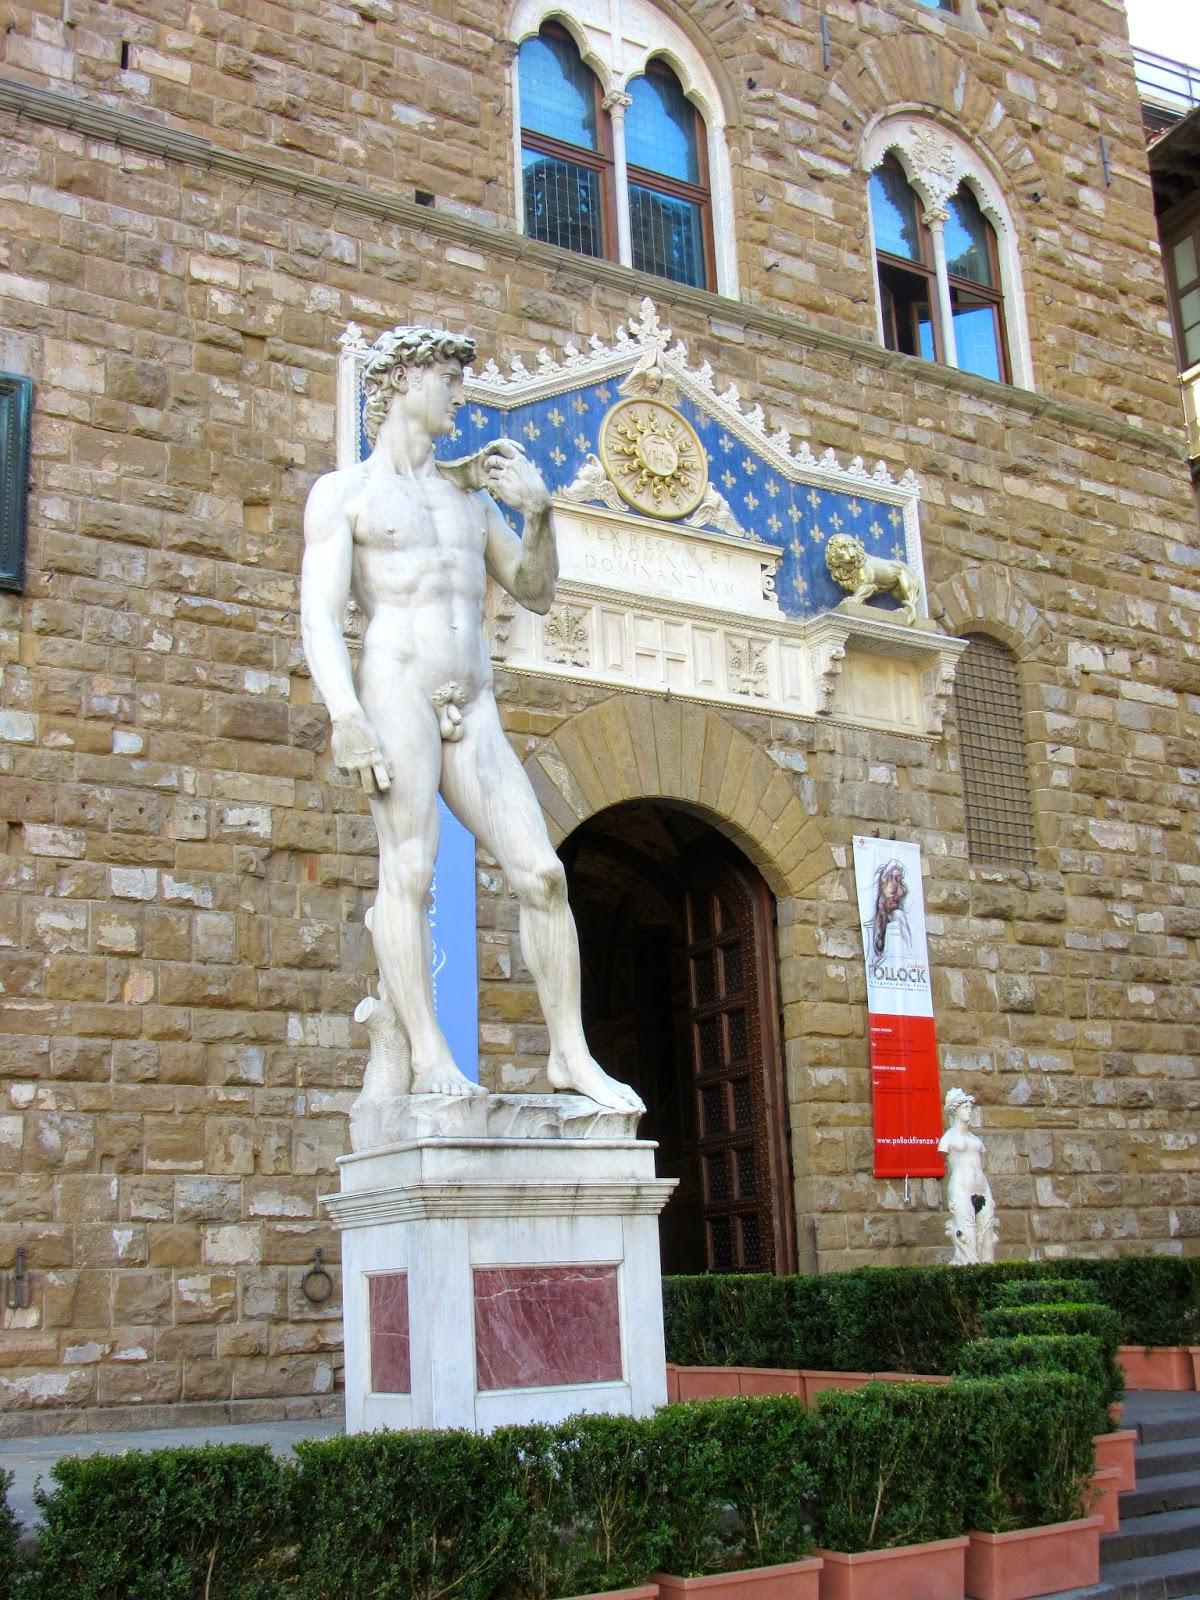 palazzo vecchio entrance - photo #11